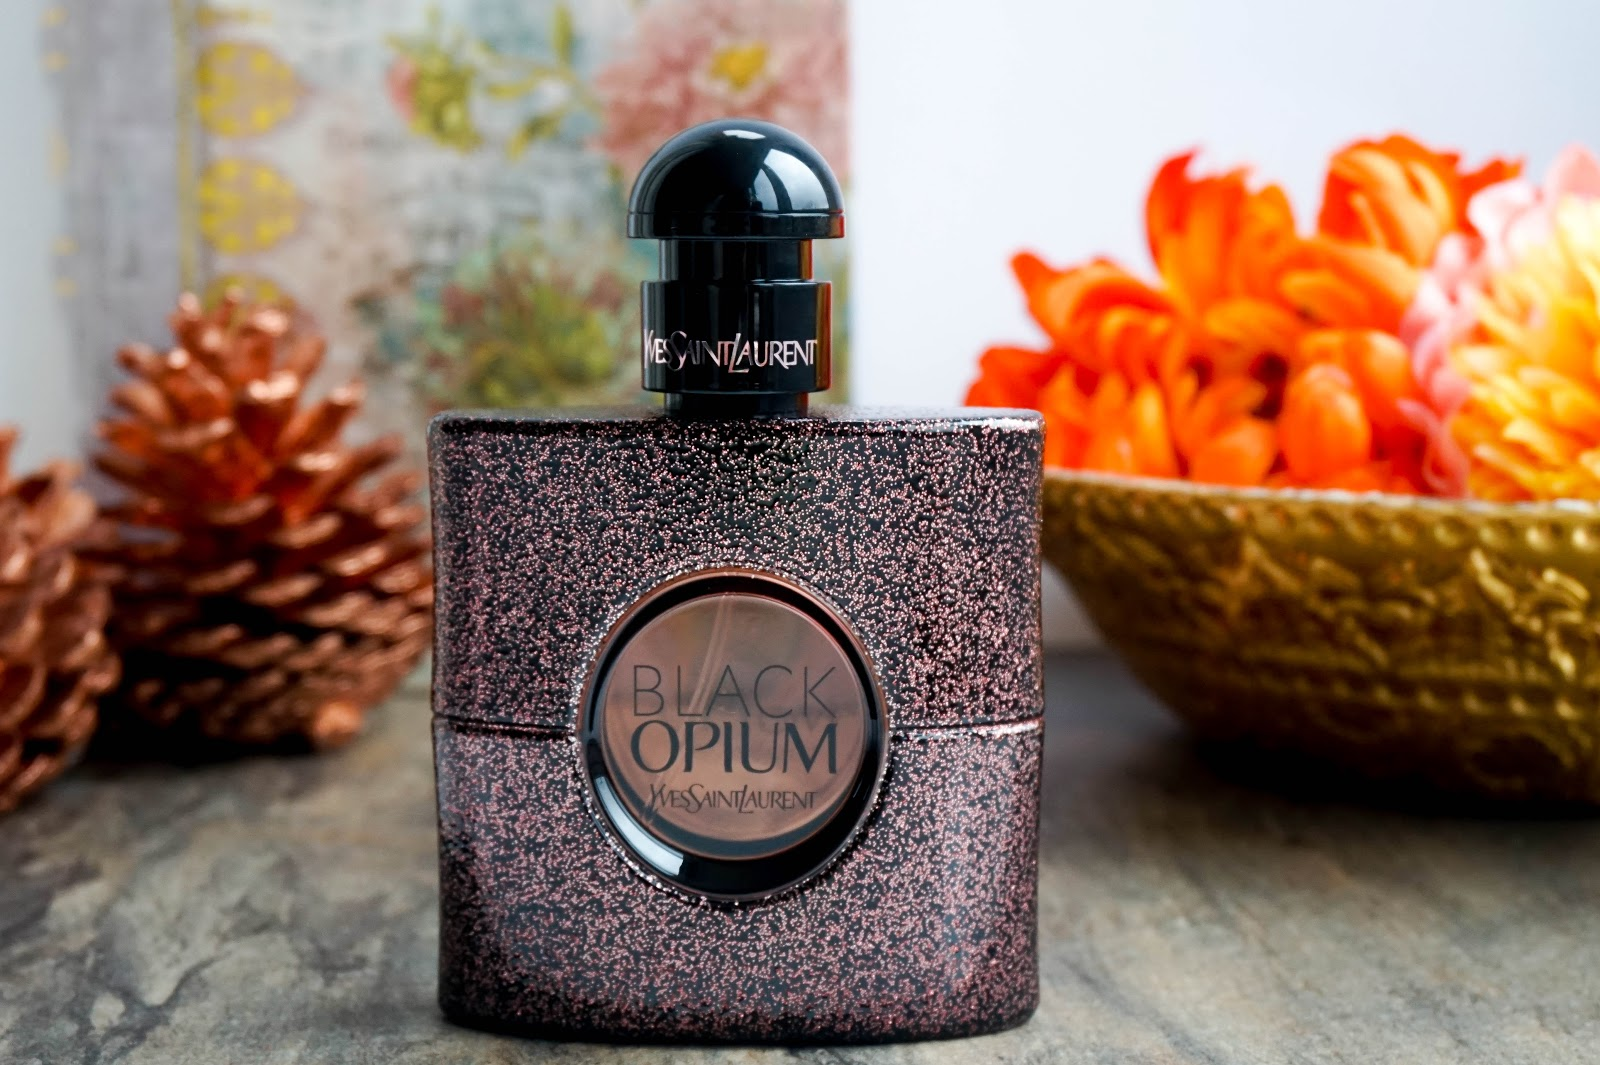 The Perfect Valentine's Fragrance with Debenhams